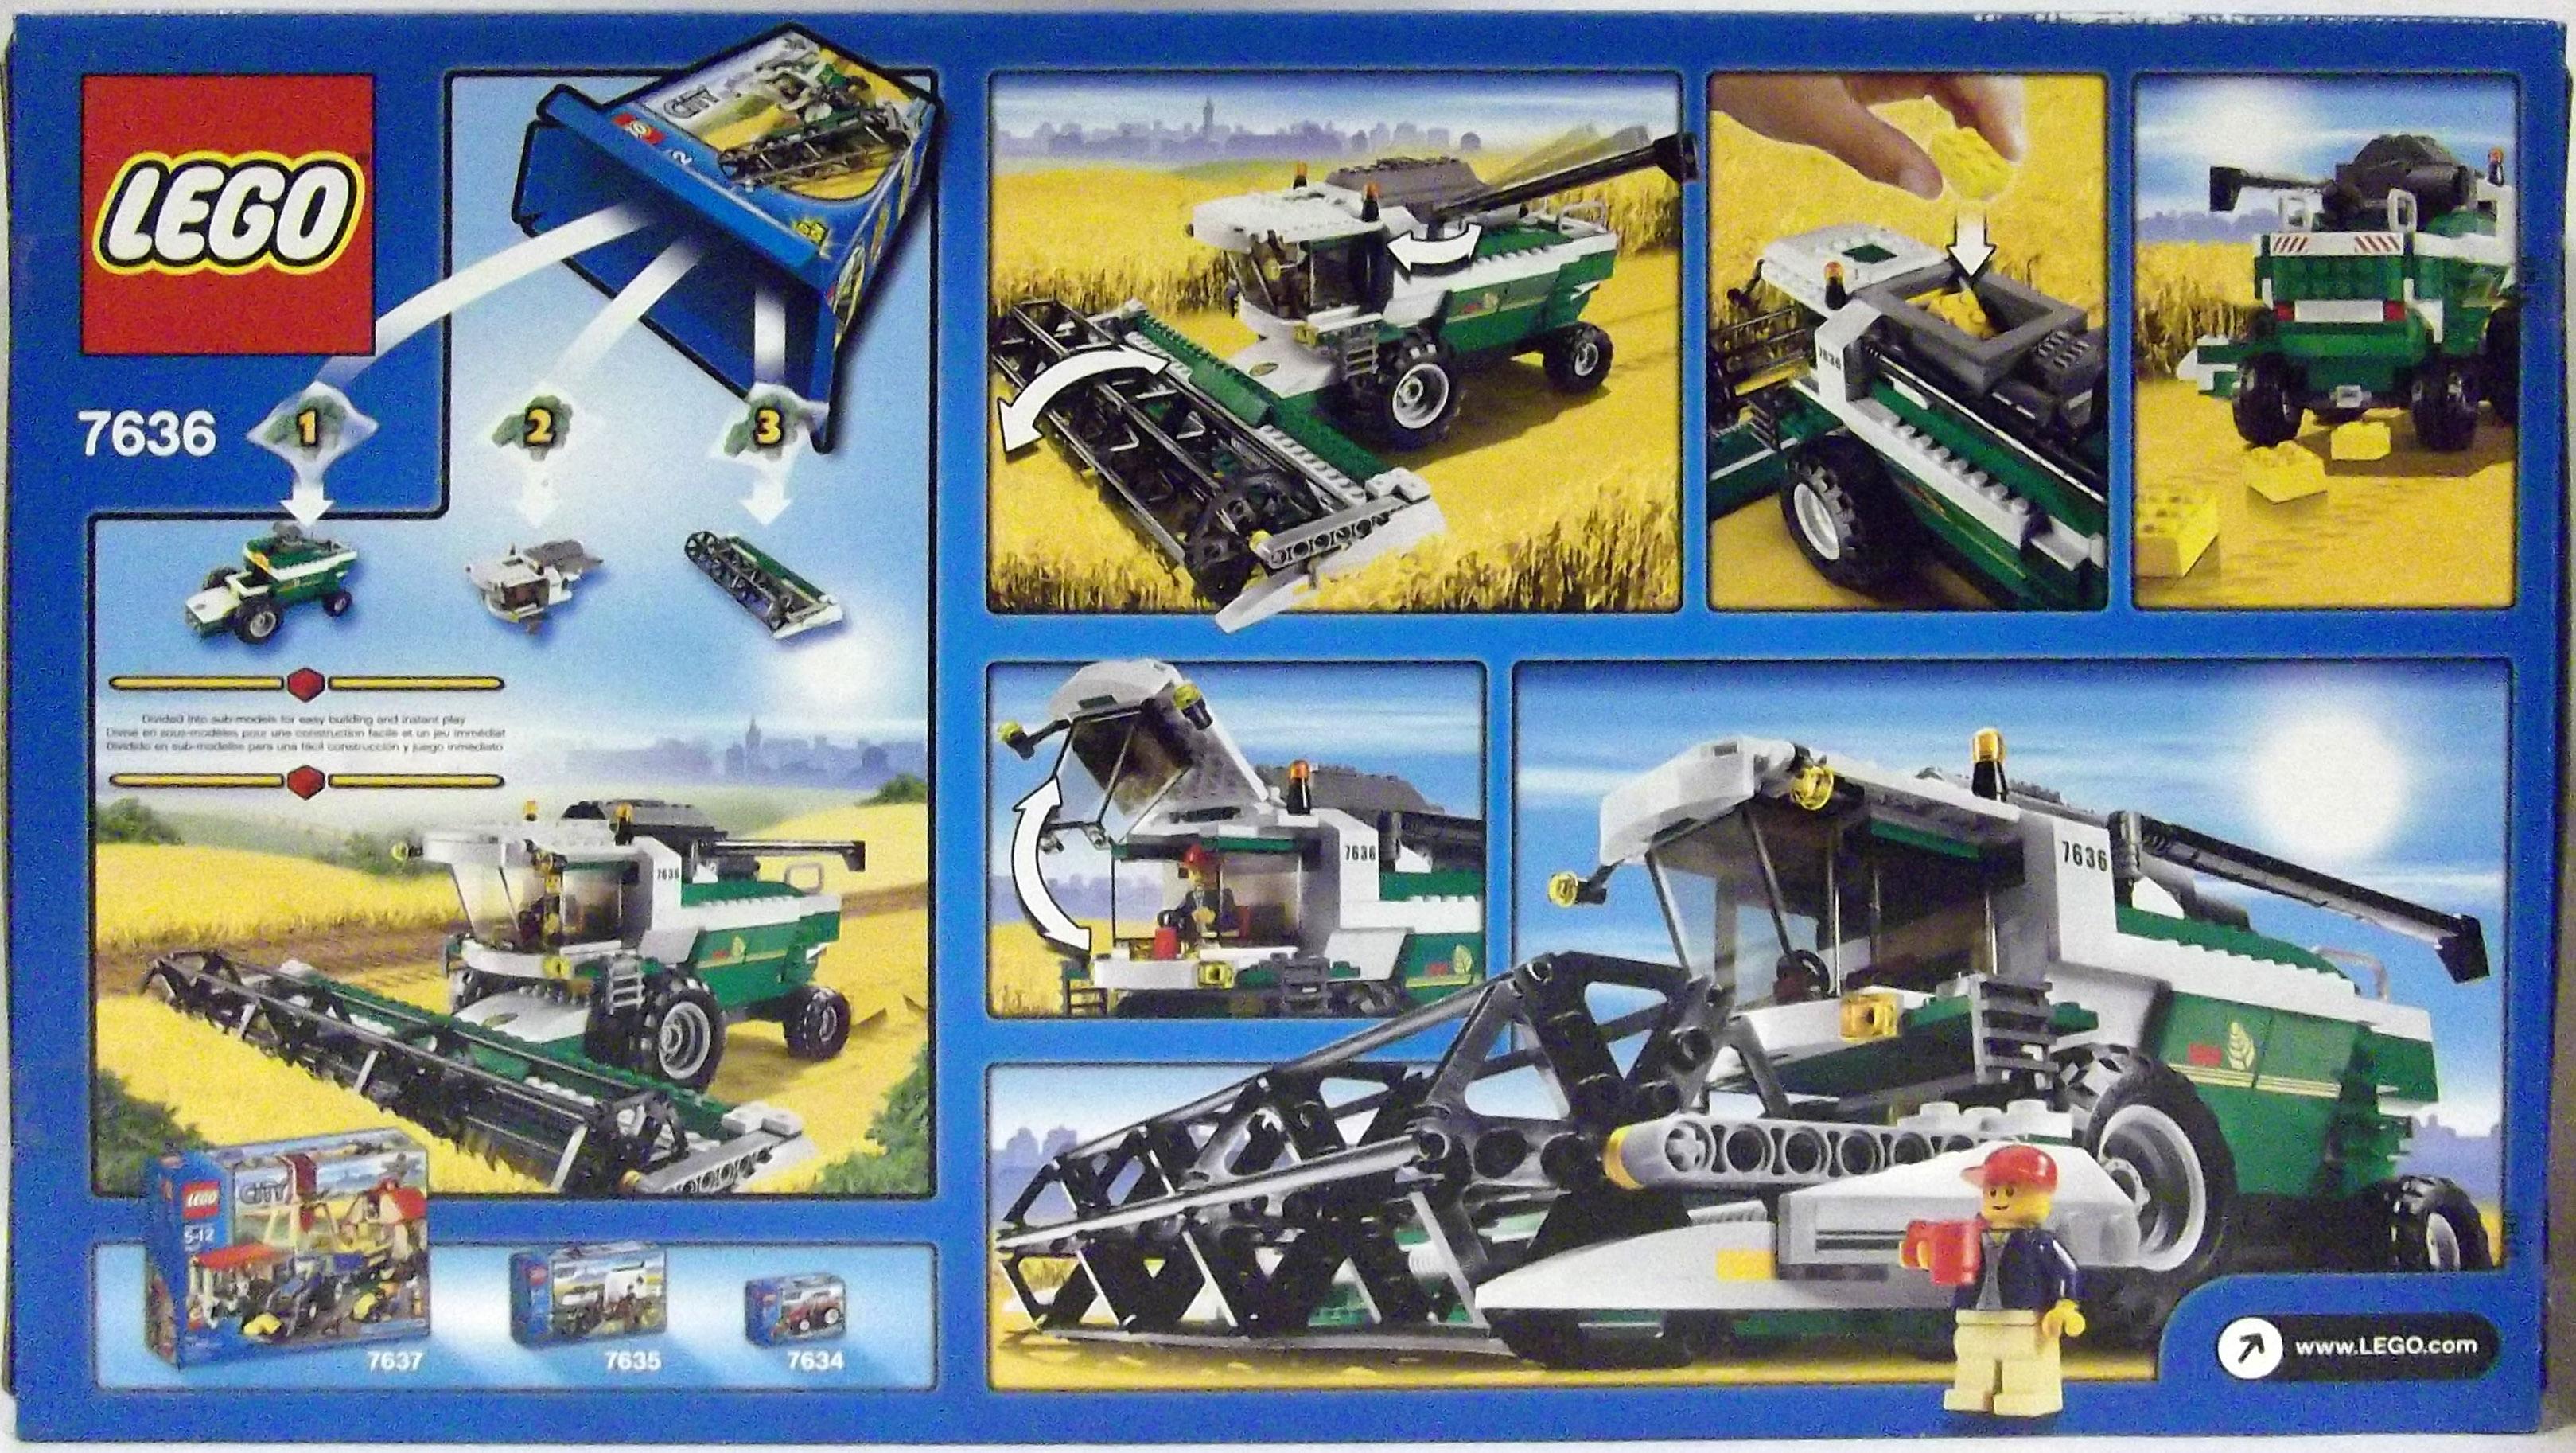 Lego Town Sets Lego City Farm 7636 Combine Harvester